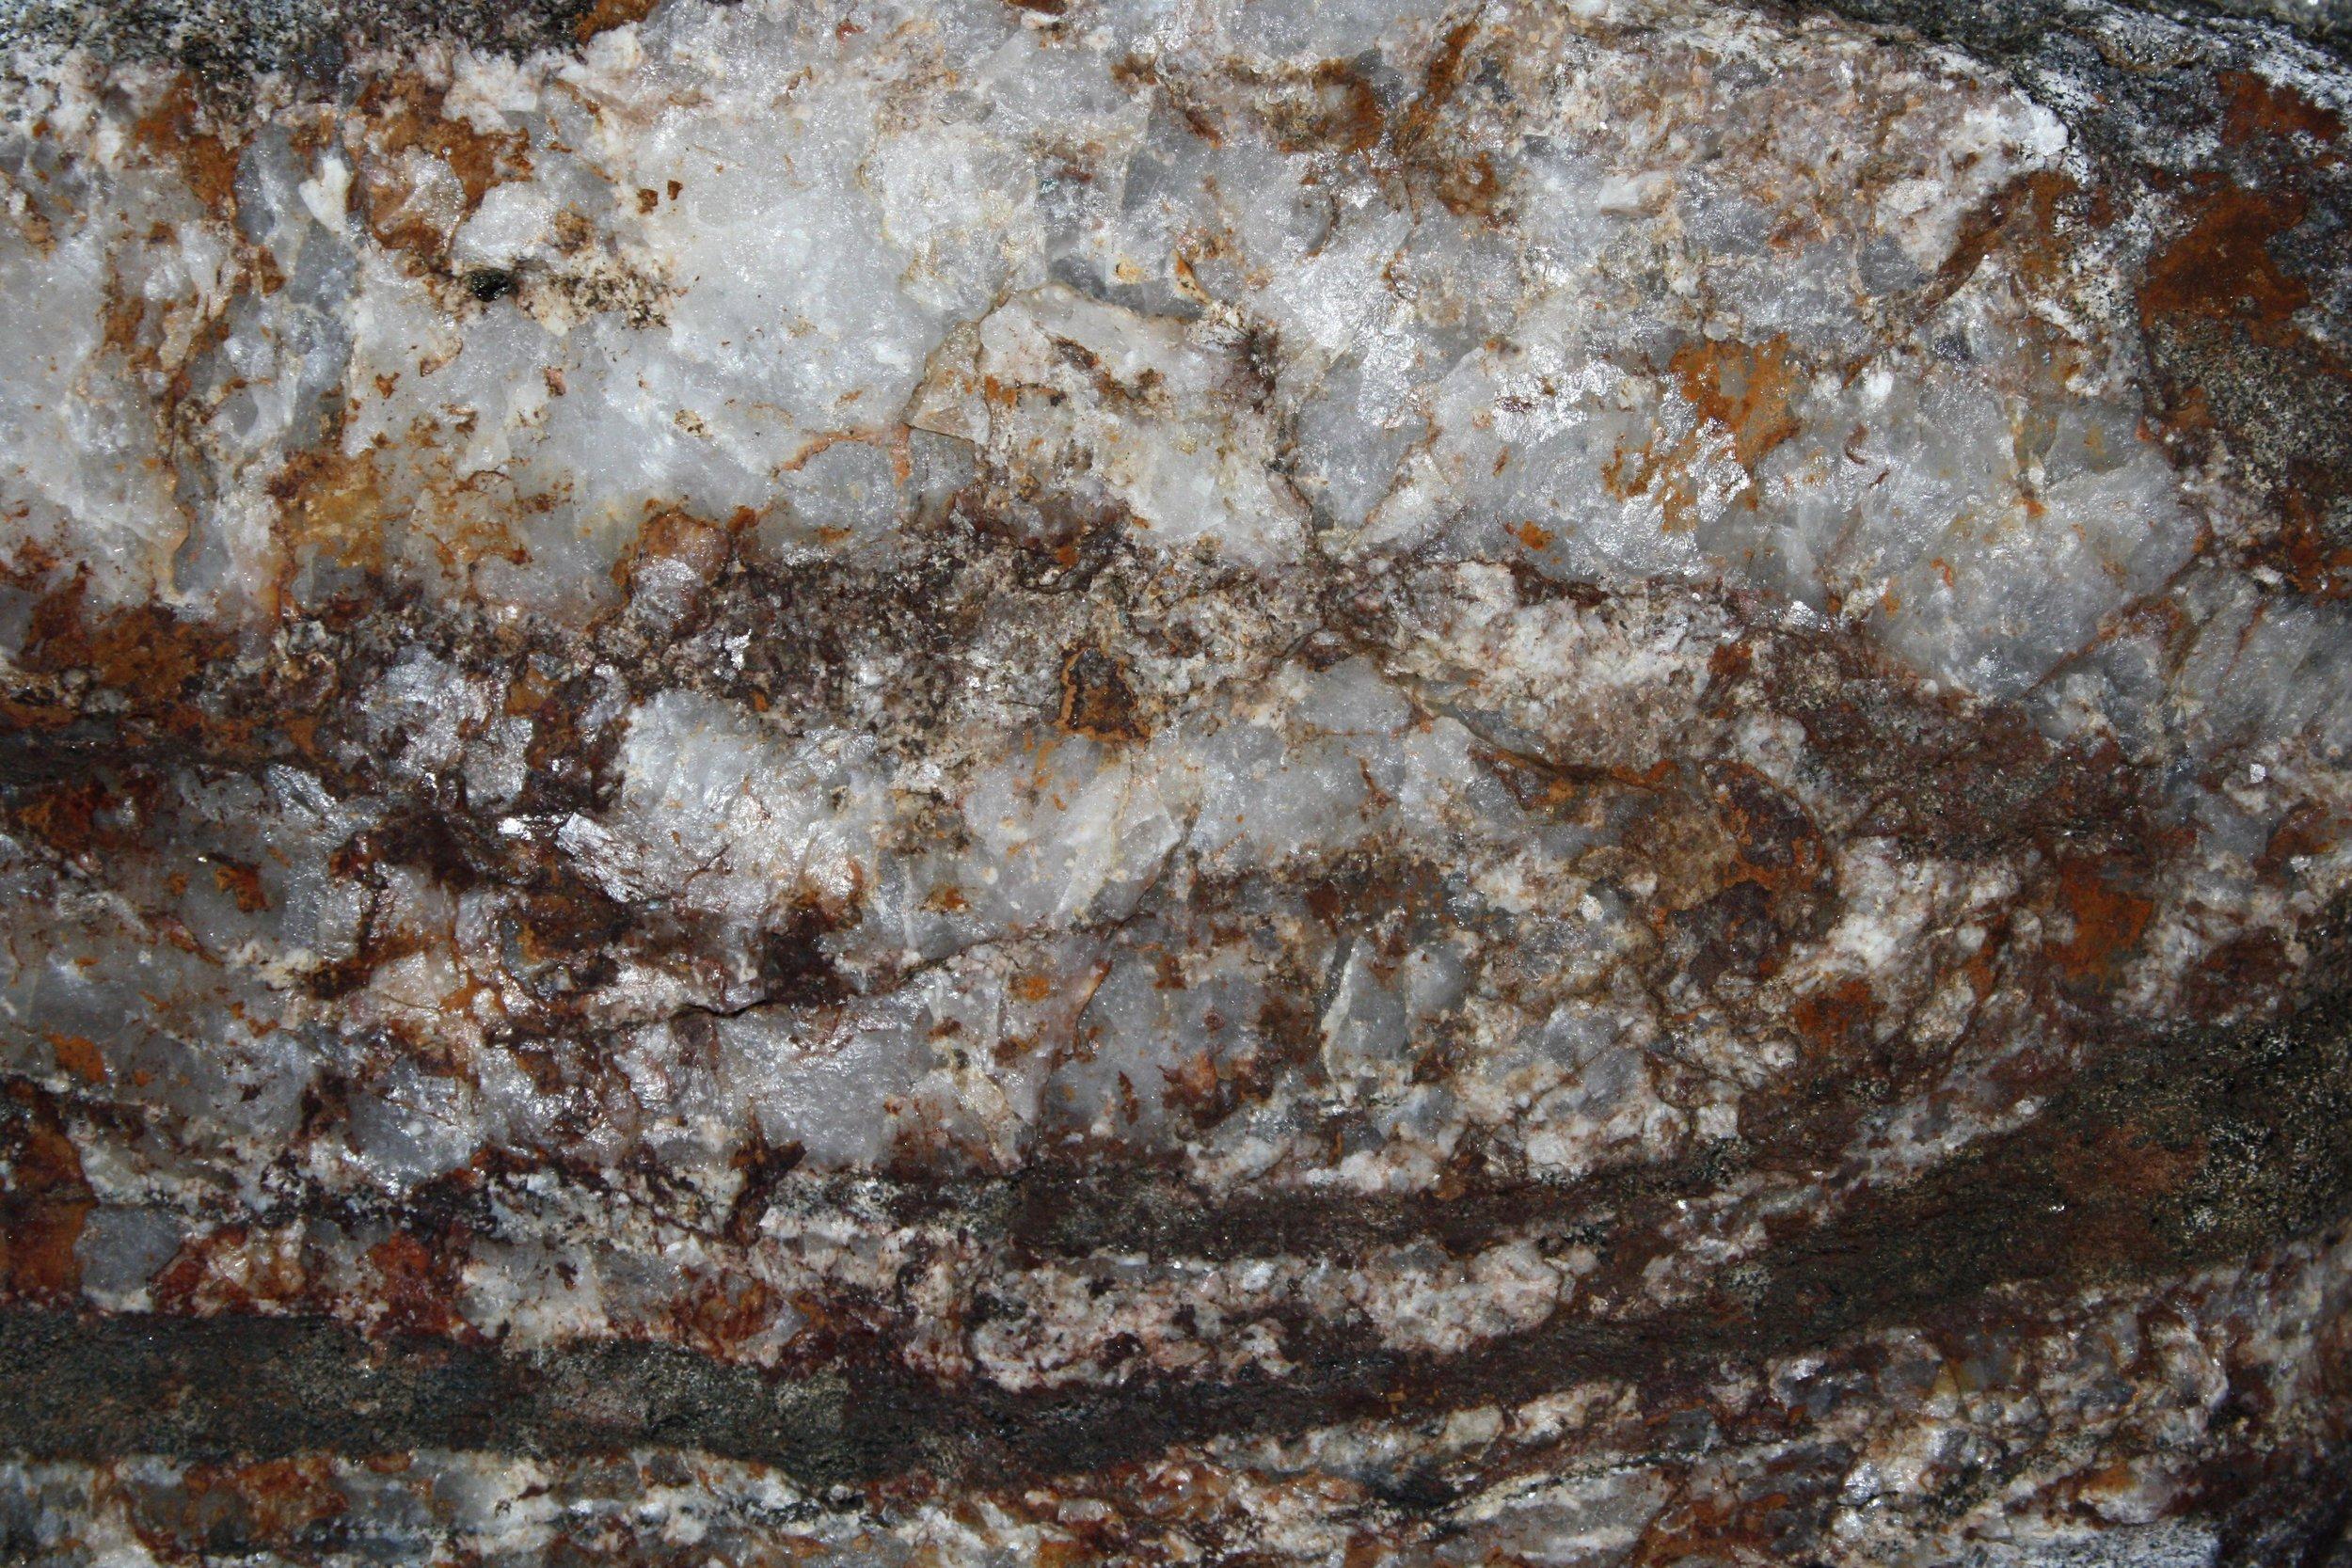 white-quartz-rock-texture-with-hematite-iron-rust-stains.jpg